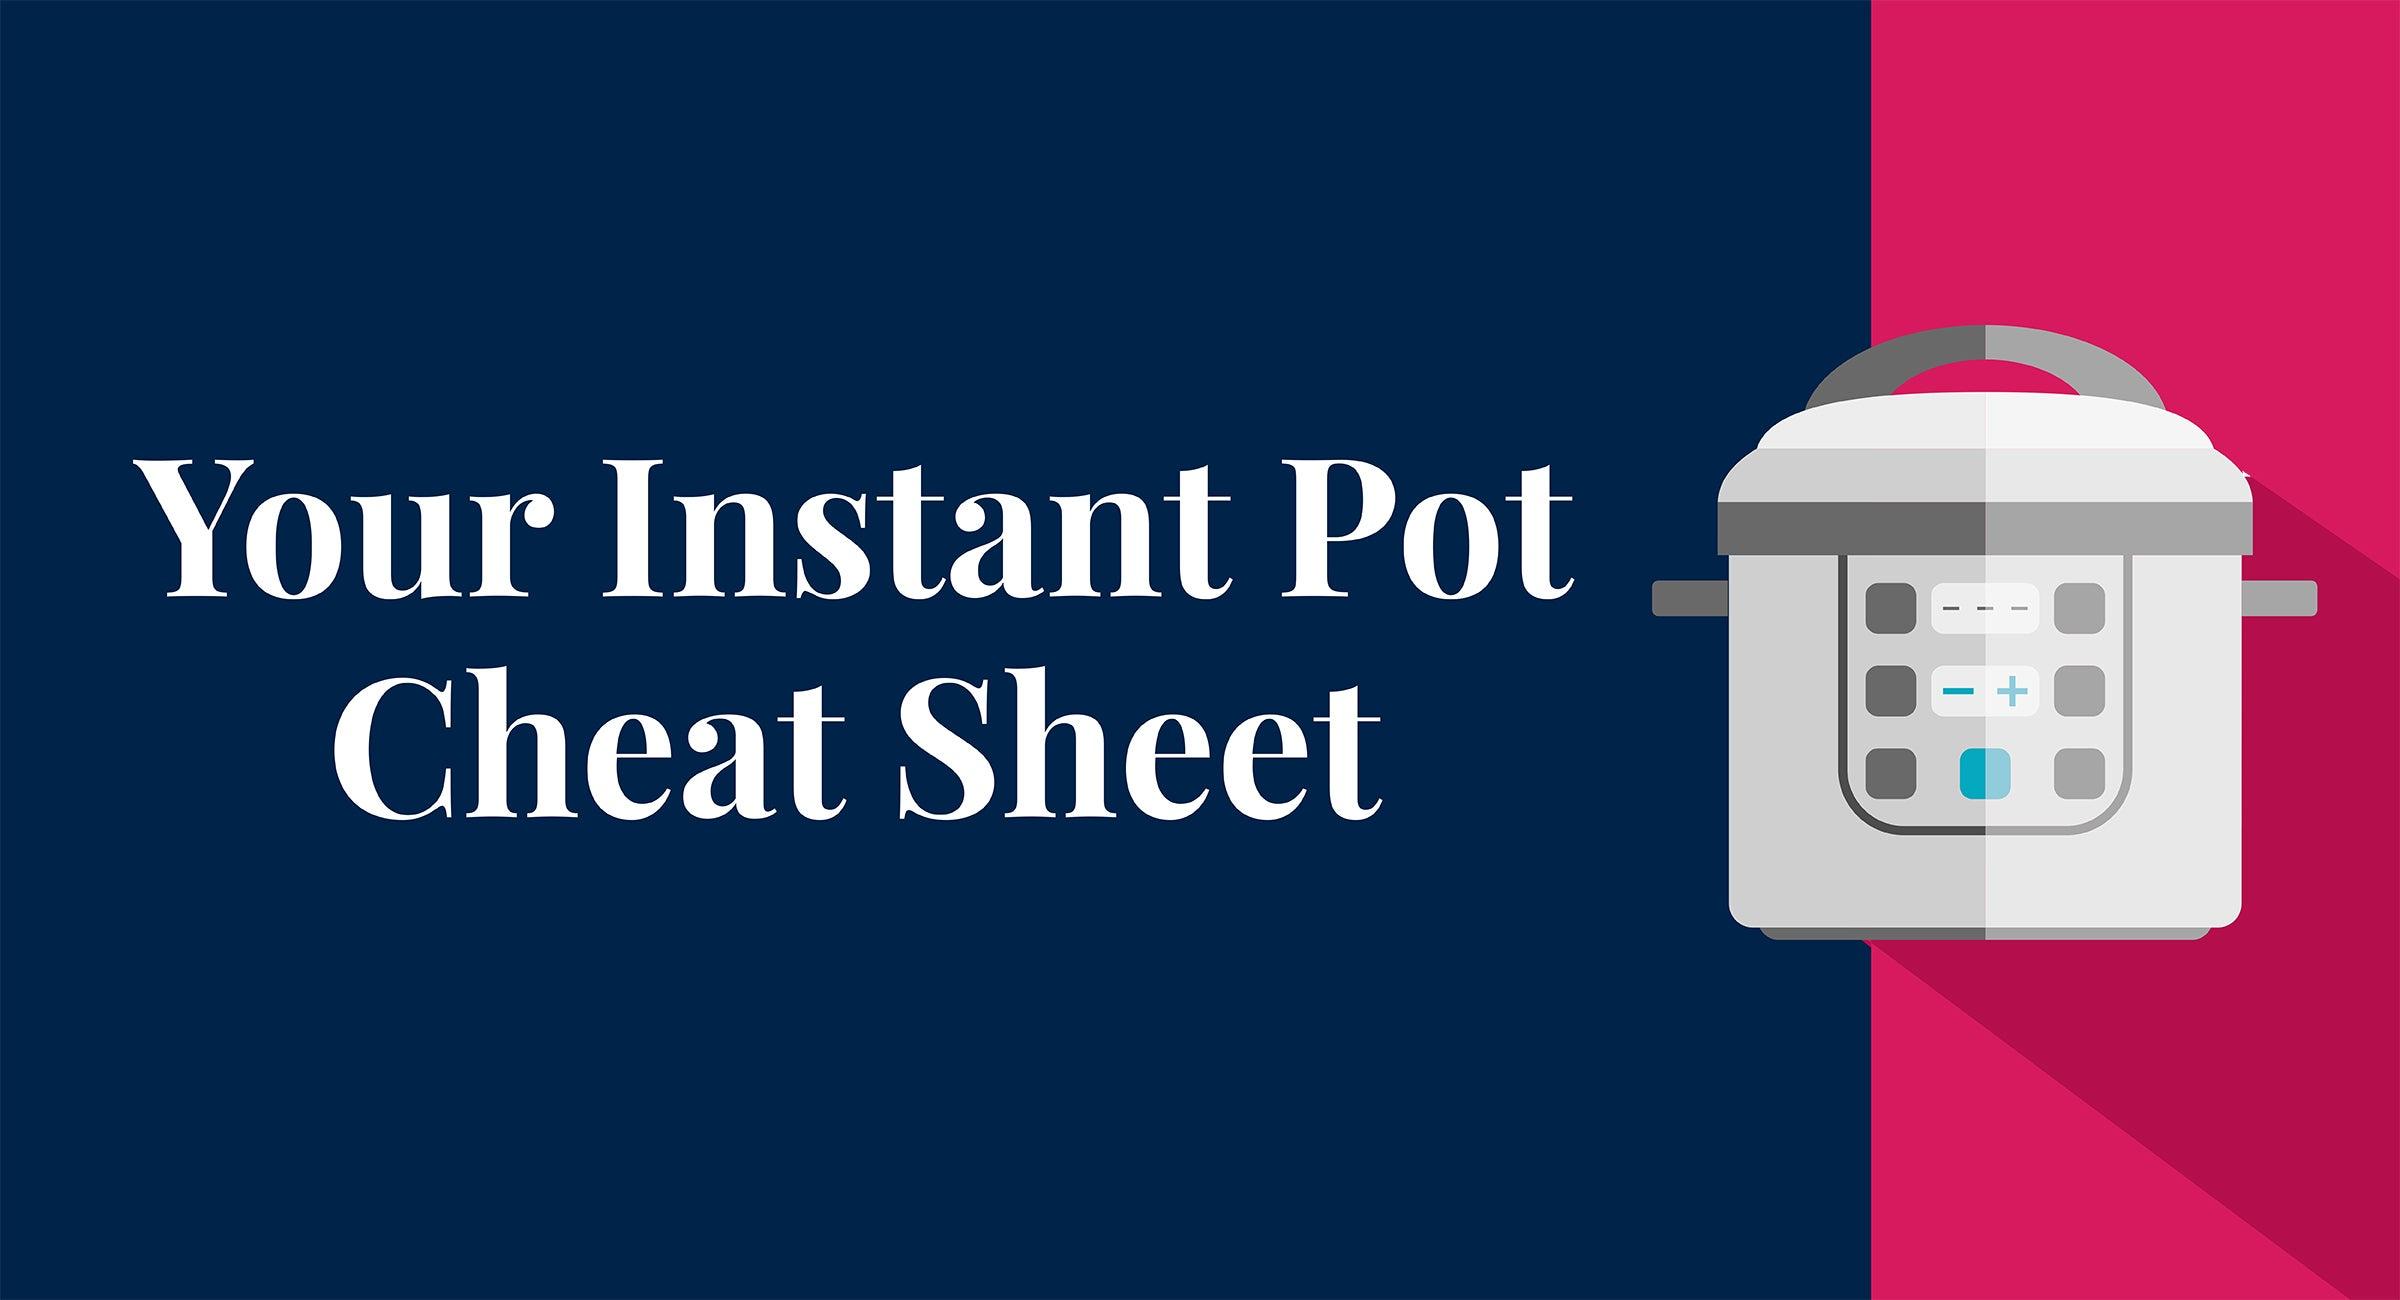 Stovetop to Instant Pot? No Problem.